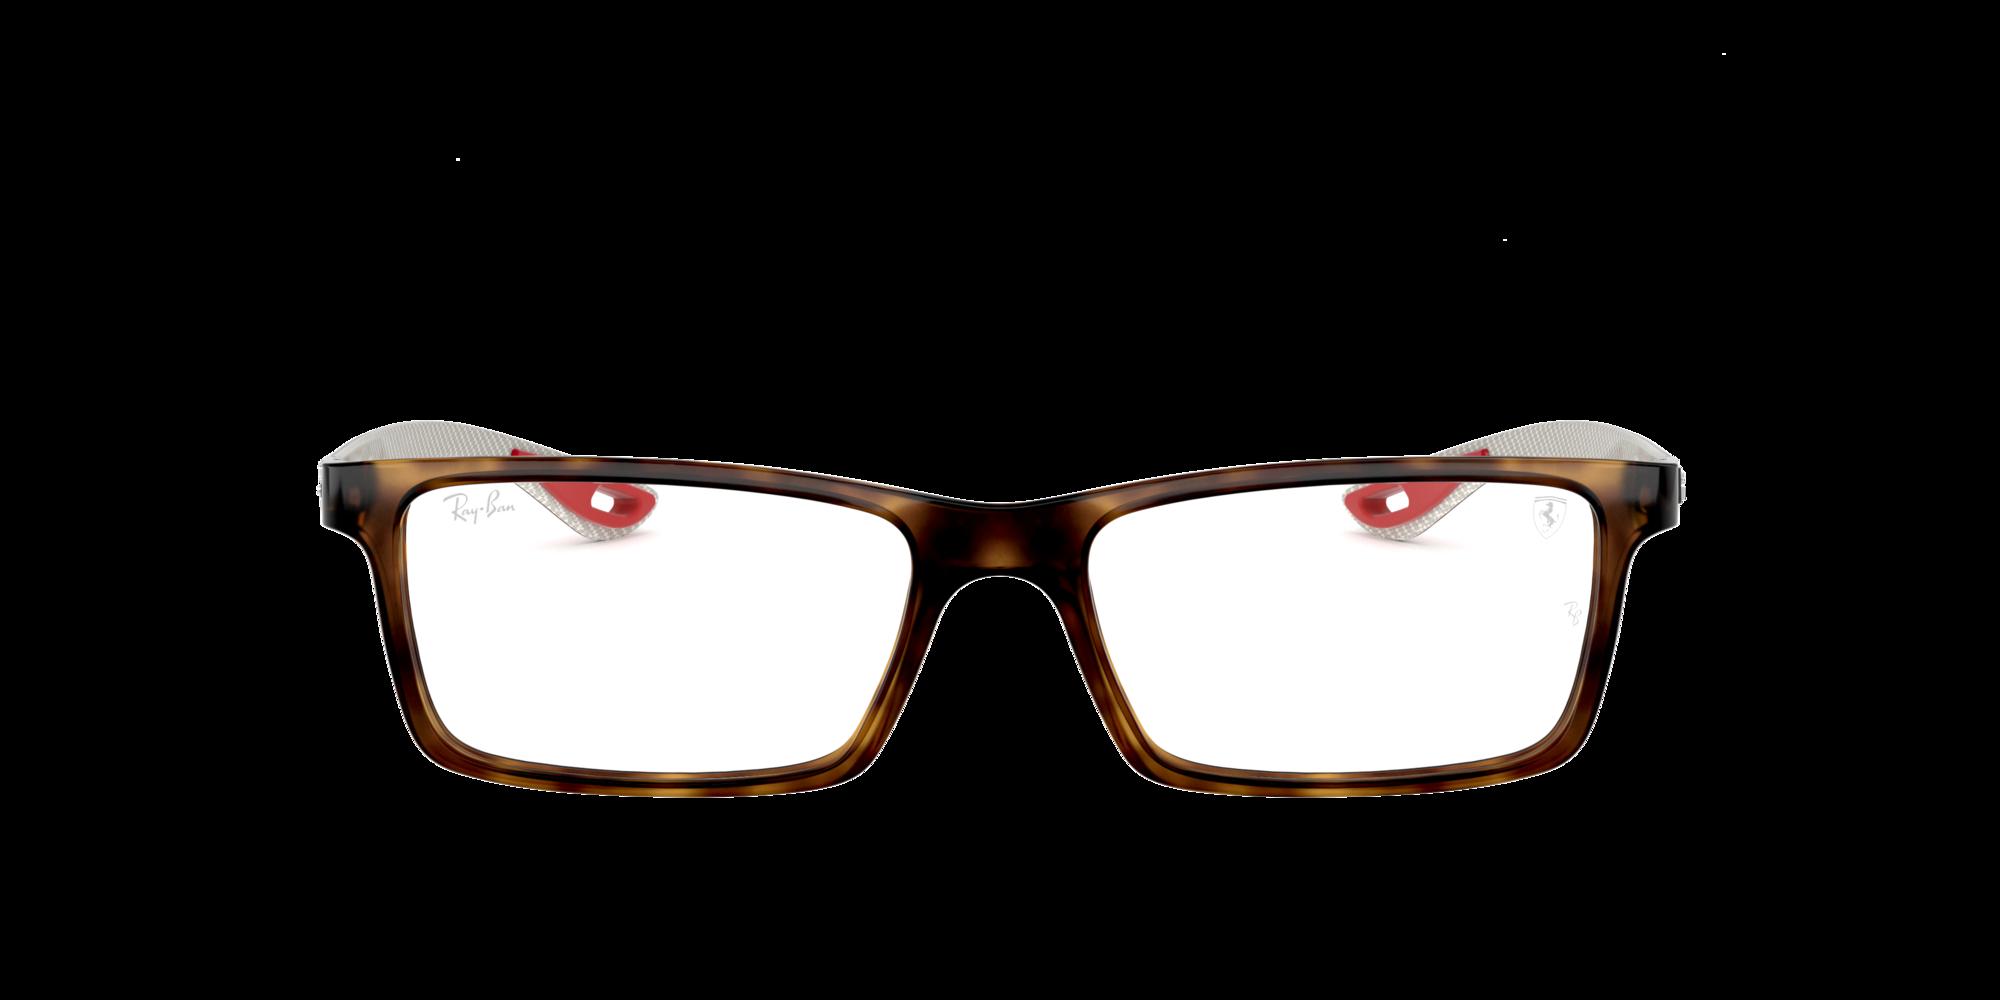 Image for RX8901M FERRARI from LensCrafters | Glasses, Prescription Glasses Online, Eyewear